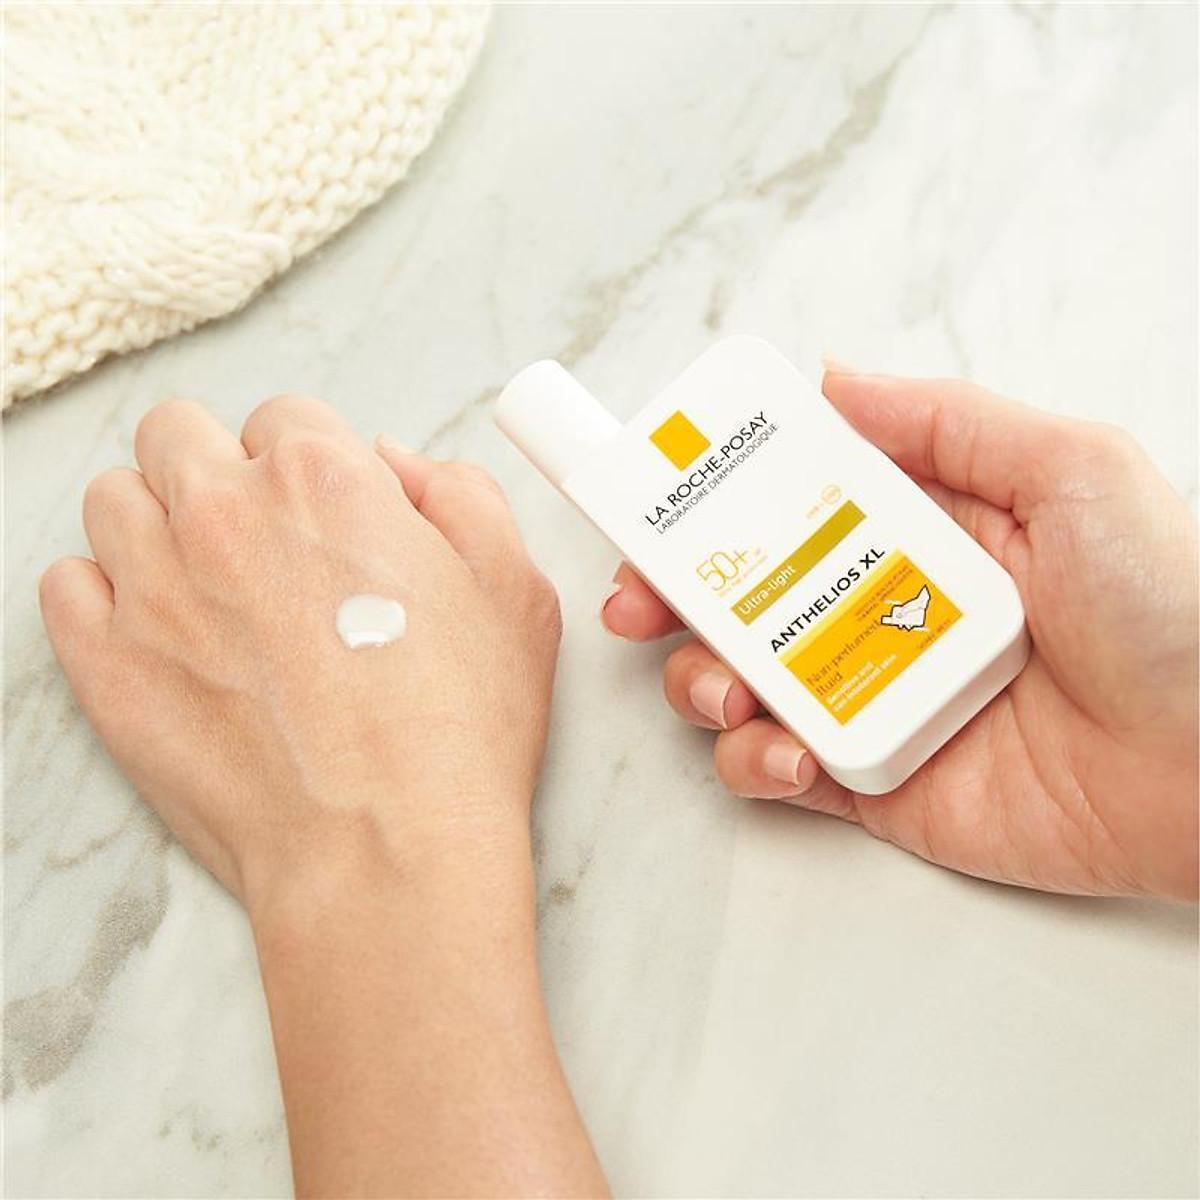 LA ROCHE-POSAY Anthelios SPF 50+ Ultra Light Sunscreen Fluid